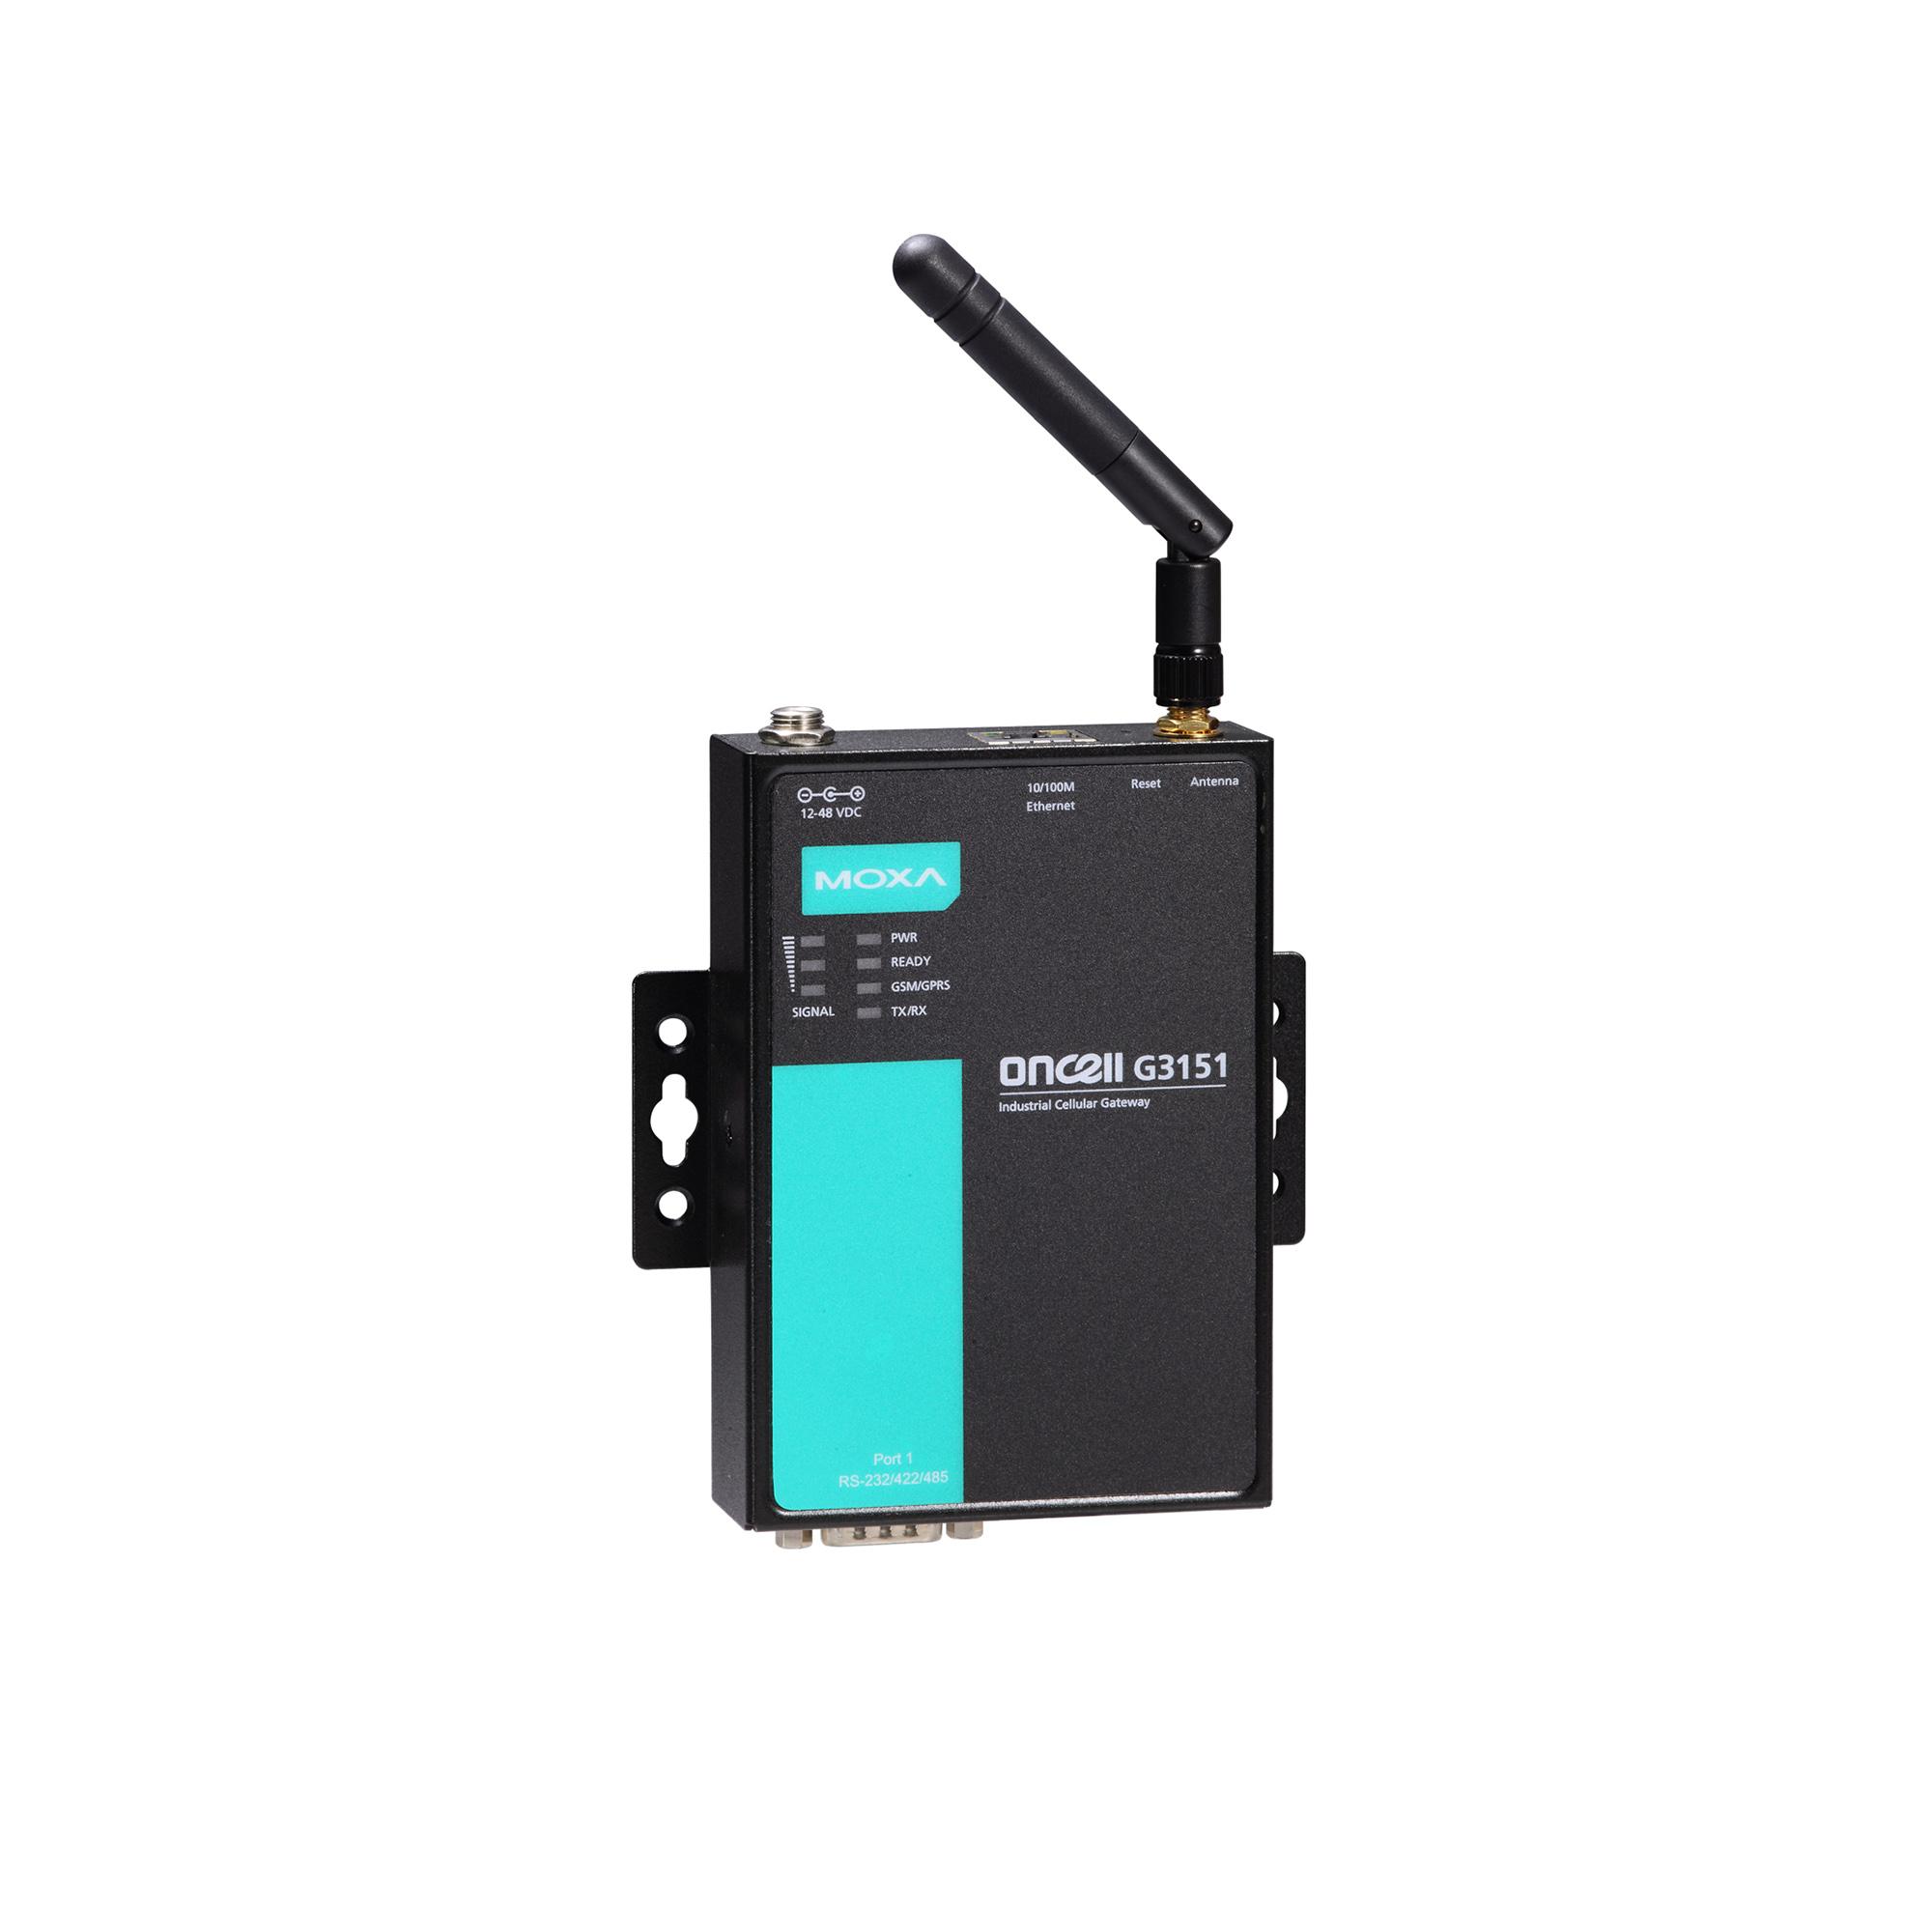 OnCell G3101/G3201 Series - Cellular Gateways | MOXA